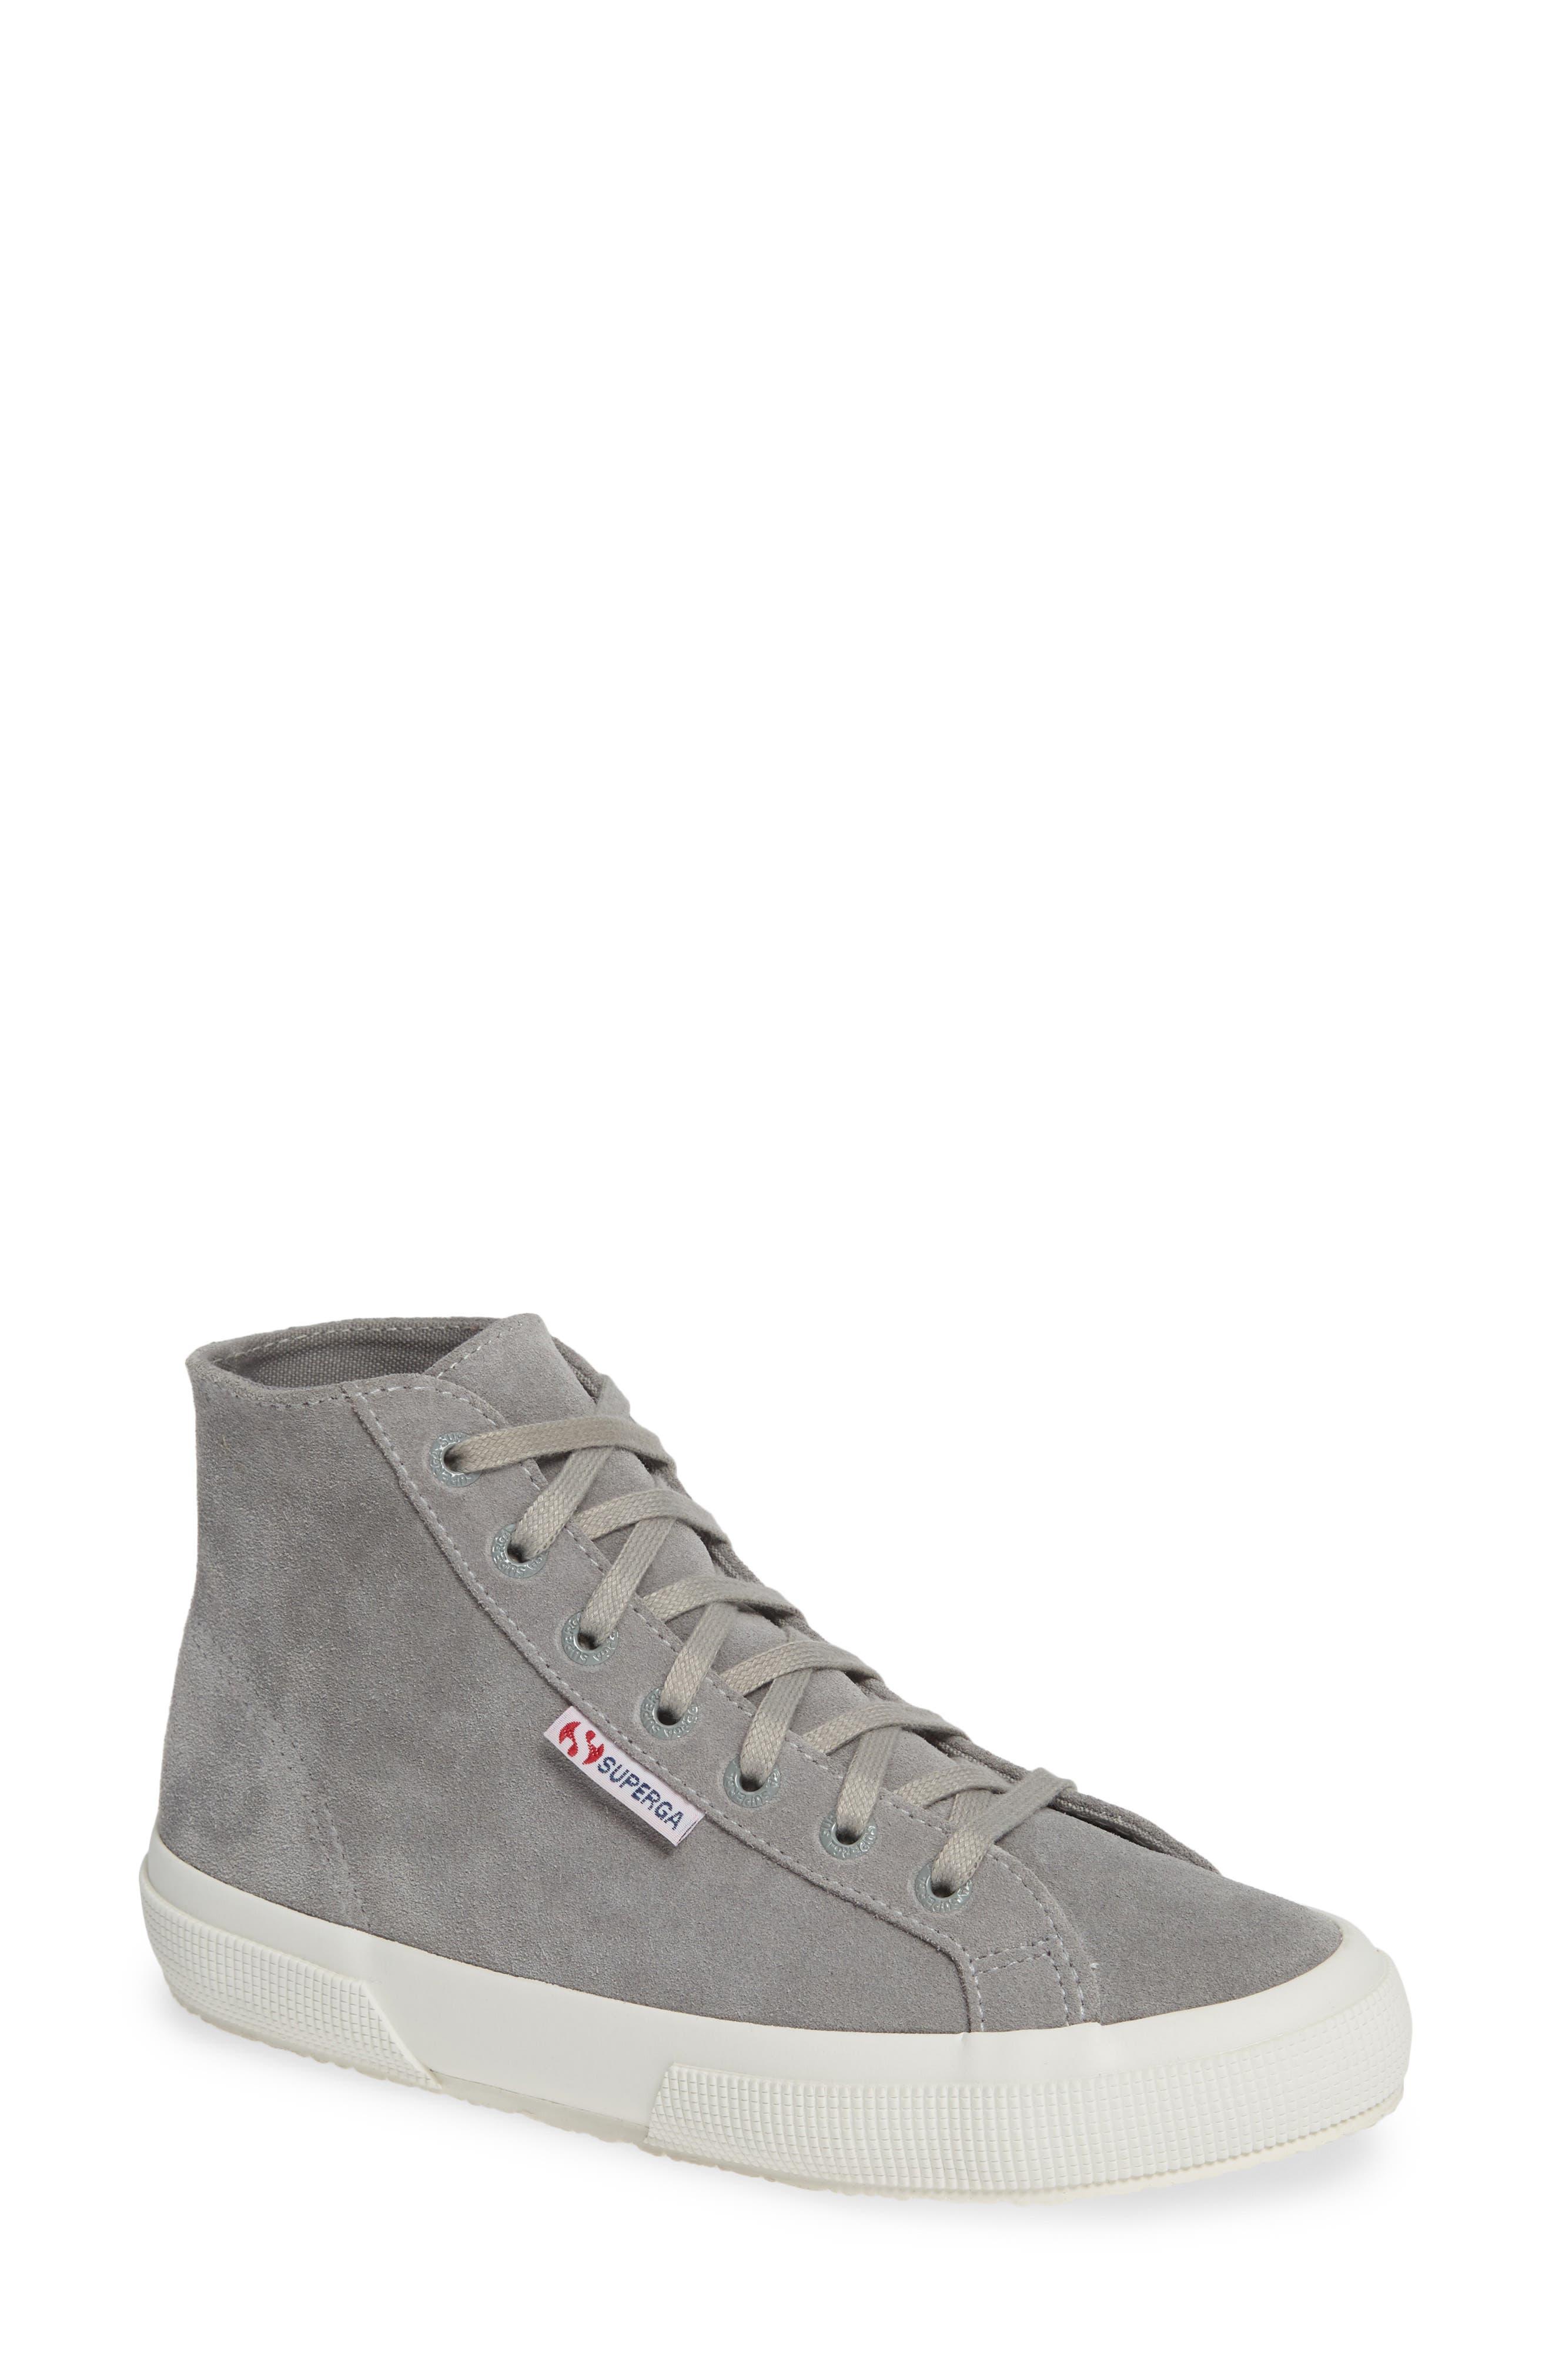 2795 High Top Sneaker,                         Main,                         color, 020